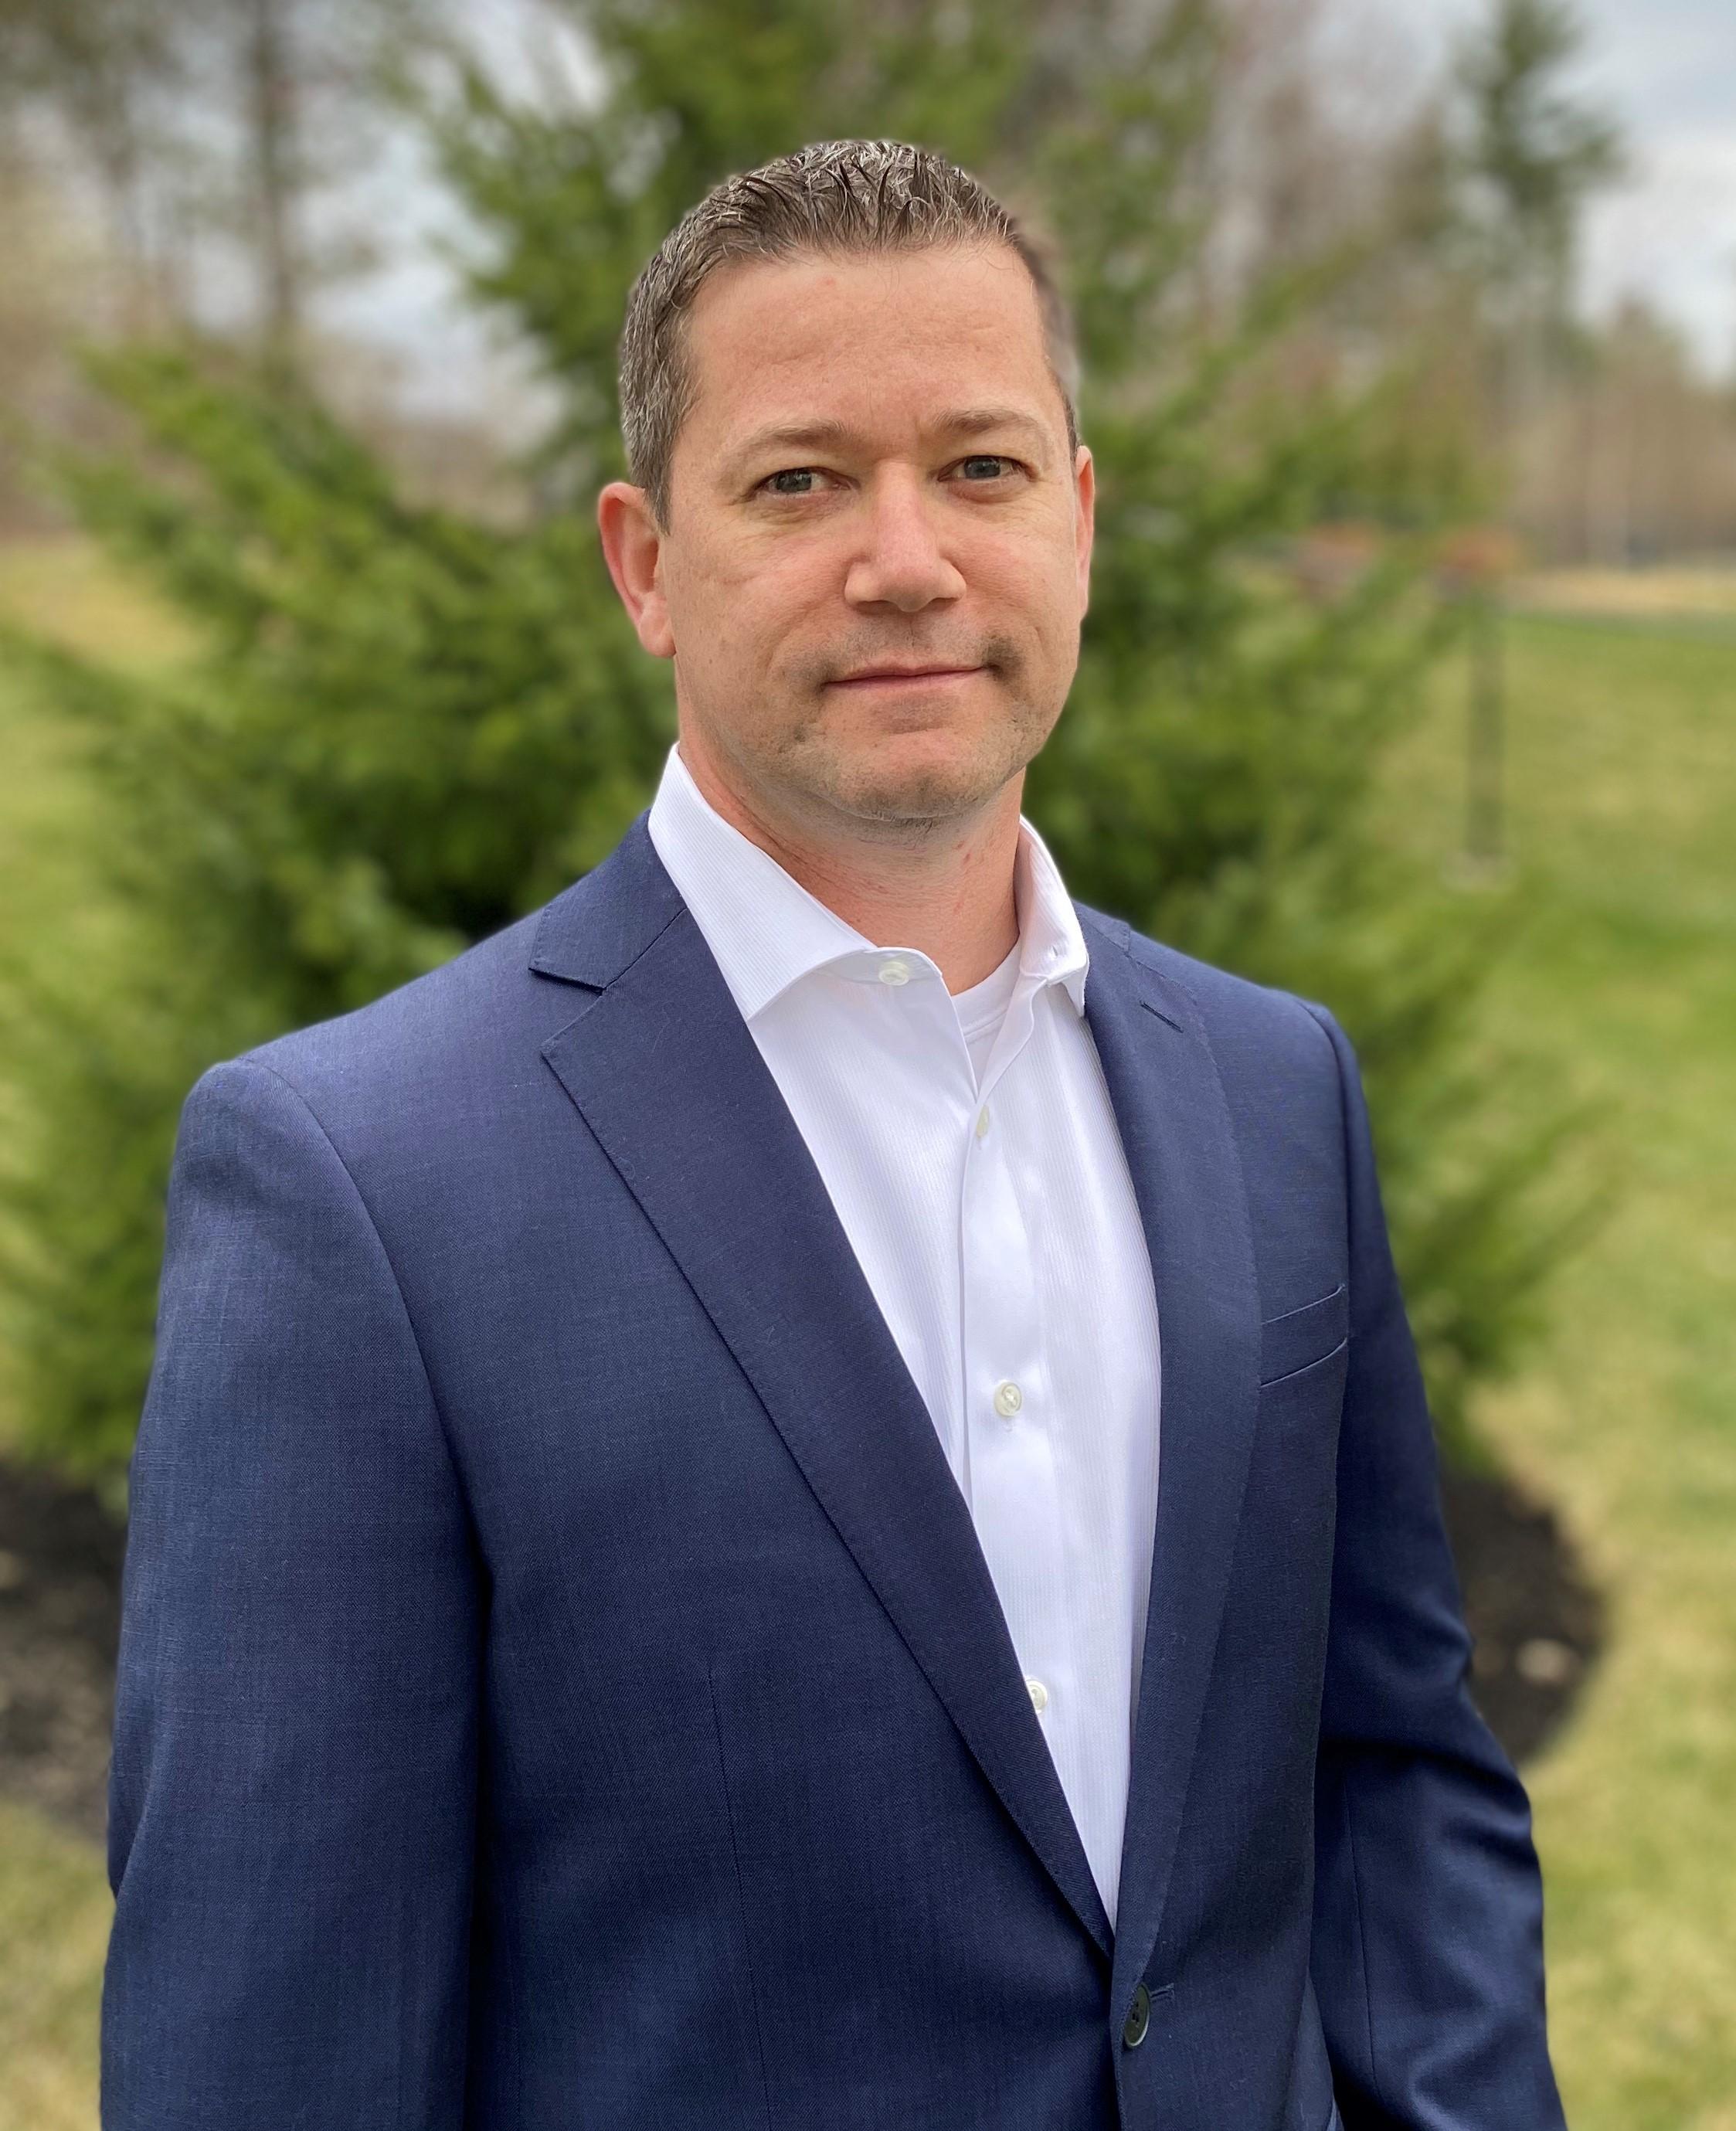 IMA Dairy & Food Hires Hayden Turner as VP of Operations